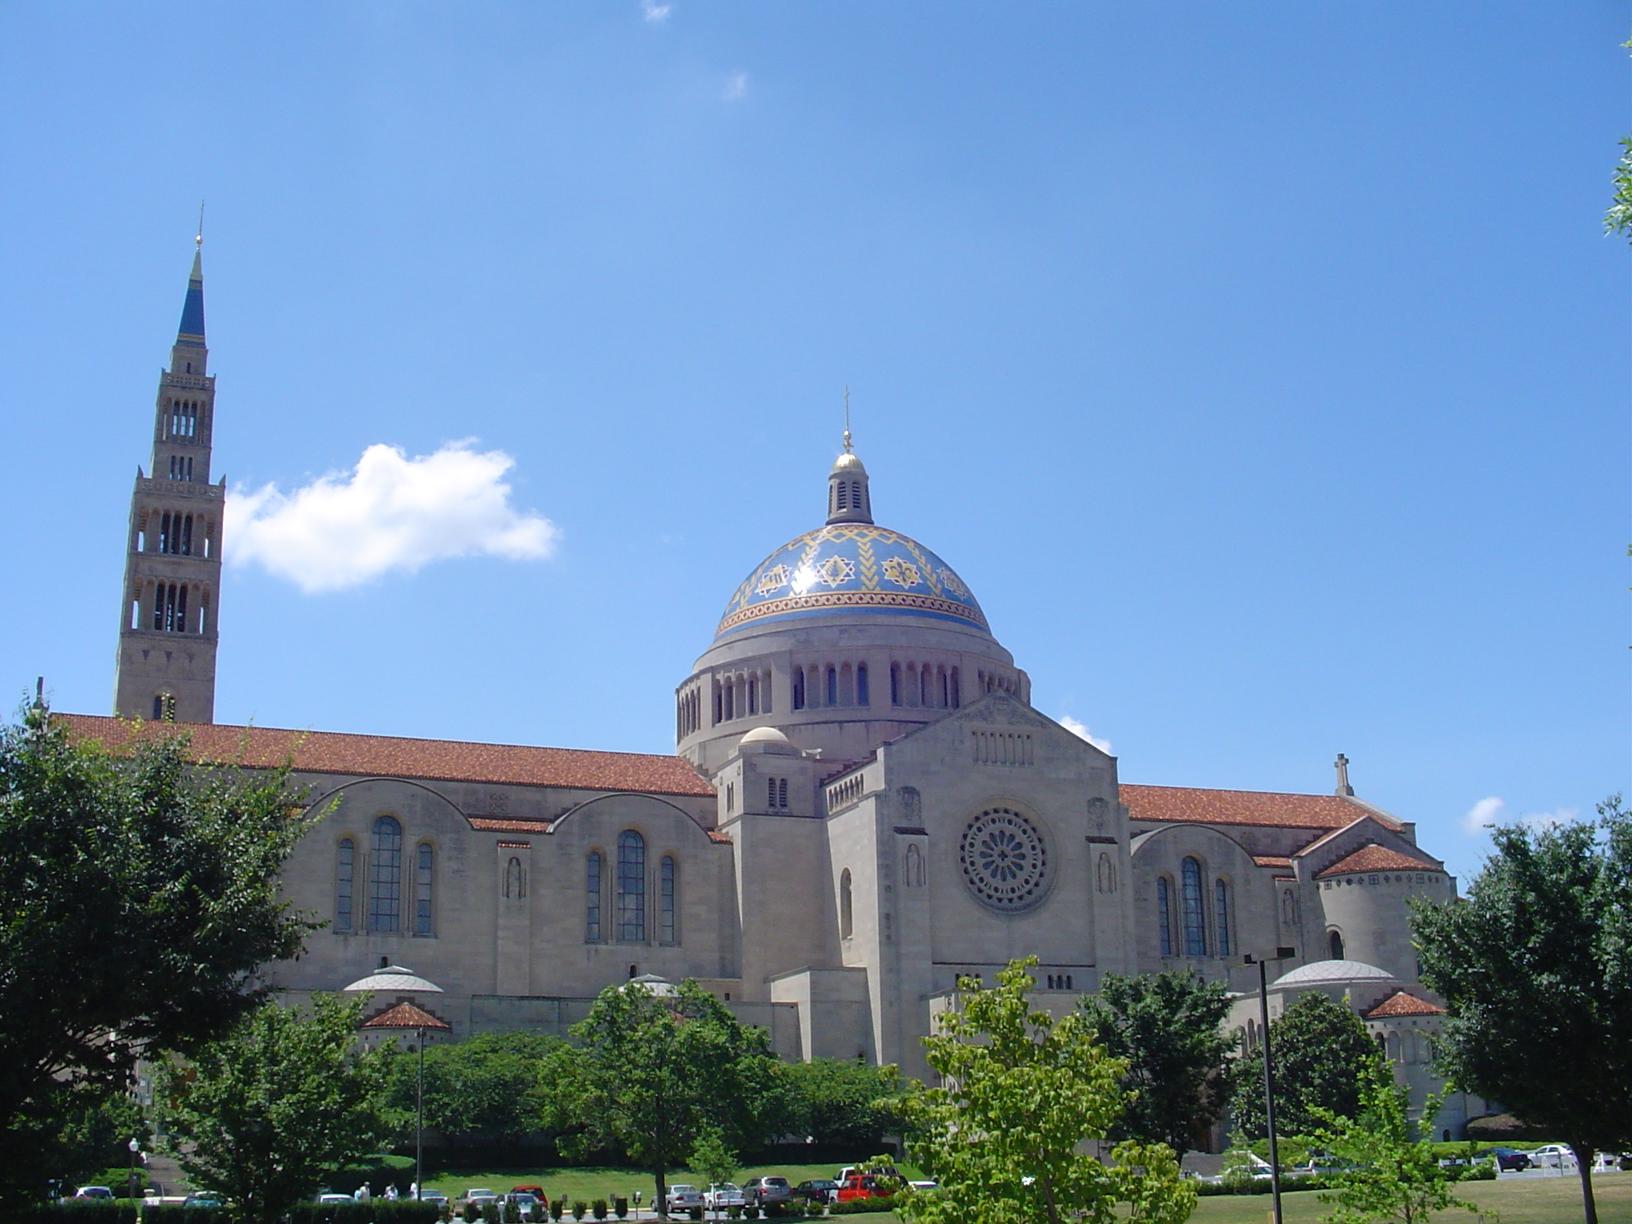 The Basilica of the National Shrine